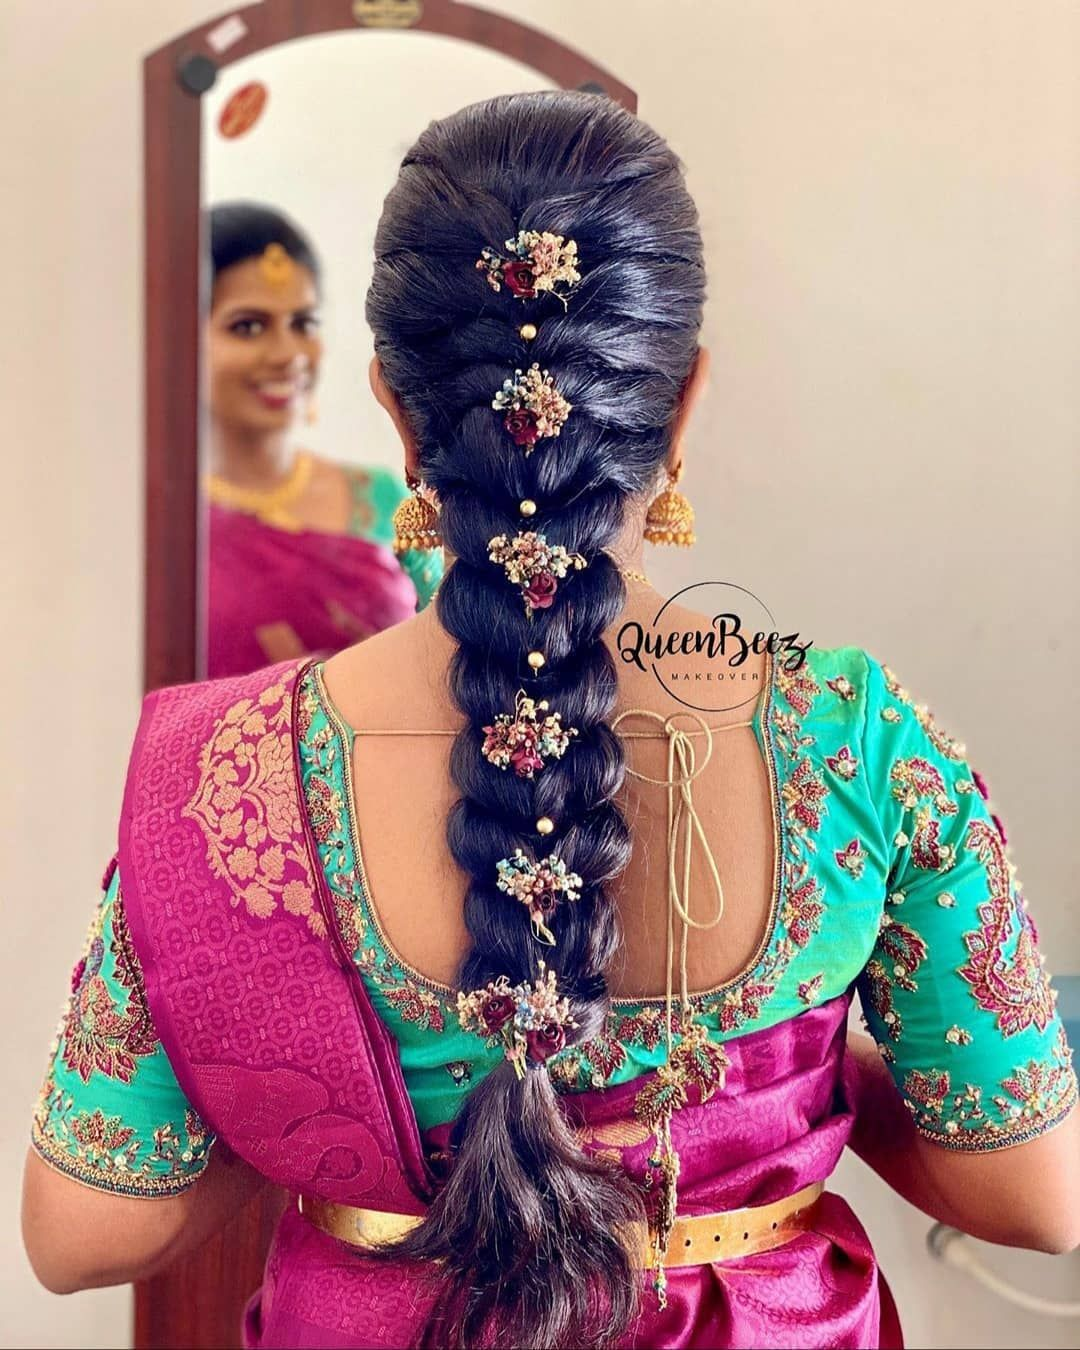 14 Likes 0 Comments Hairstylerukku Hairstylerukku On Instagram Her Choice Of Hairstyle Is Just In 2020 Hair Styles Indian Bride Hairstyle Engagement Hairstyles